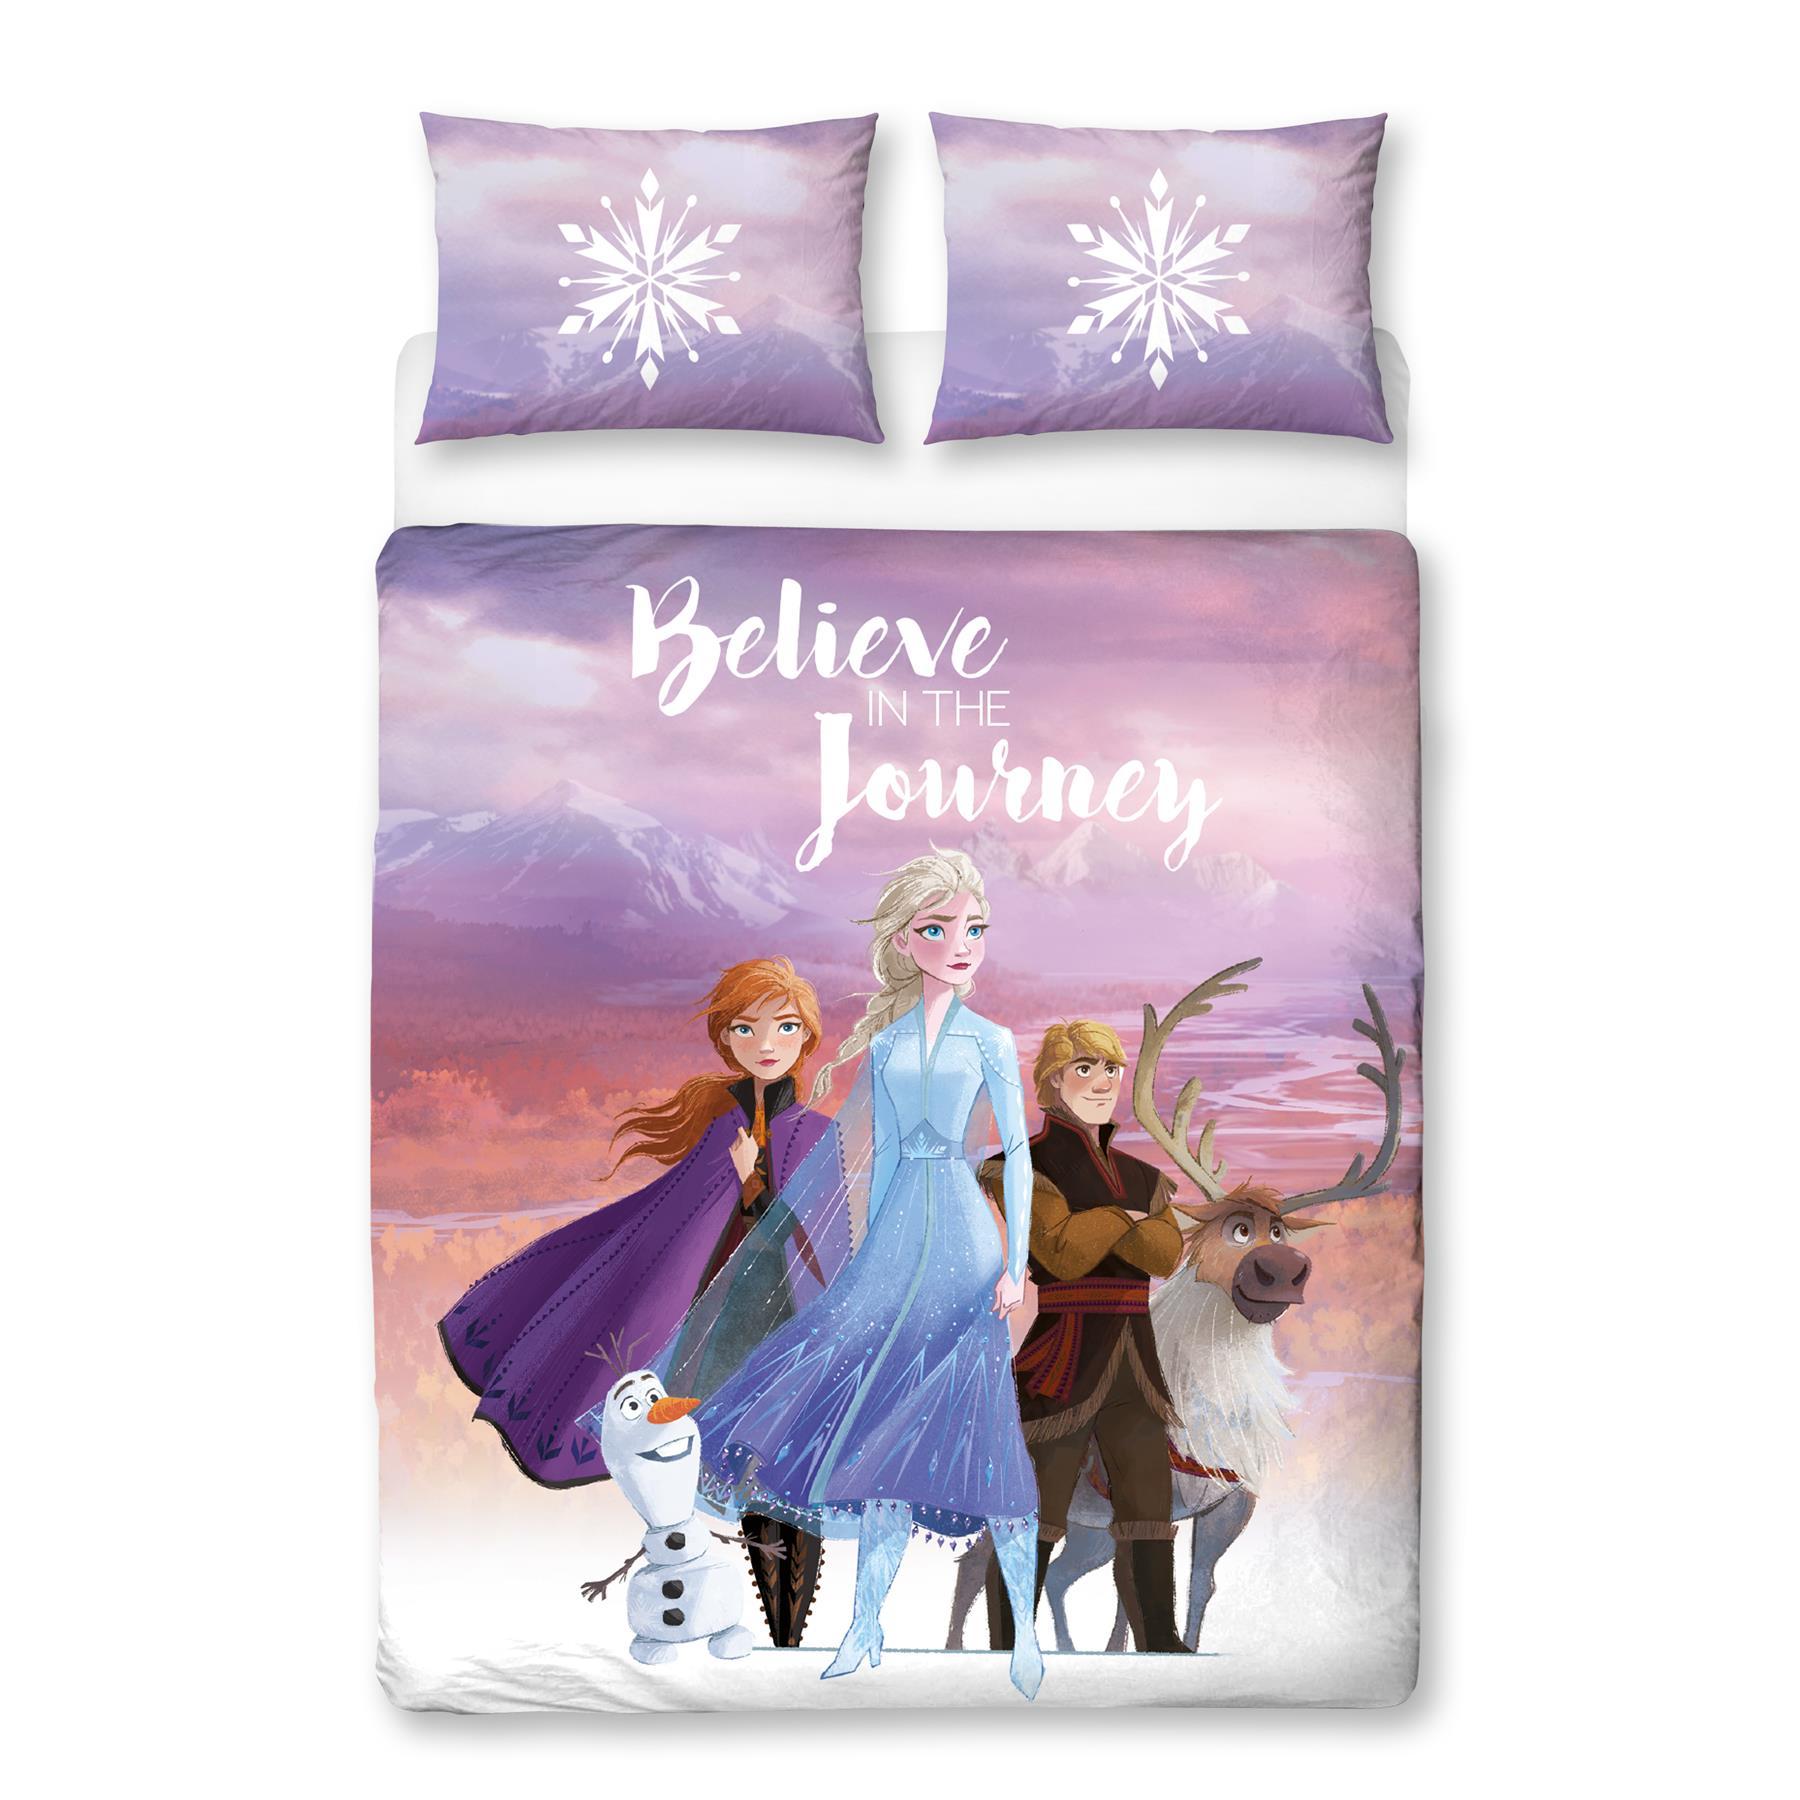 Official-Frozen-2-Duvet-Covers-Single-Double-Reversible-Bedding-Elsa-Anna-Olaf thumbnail 10